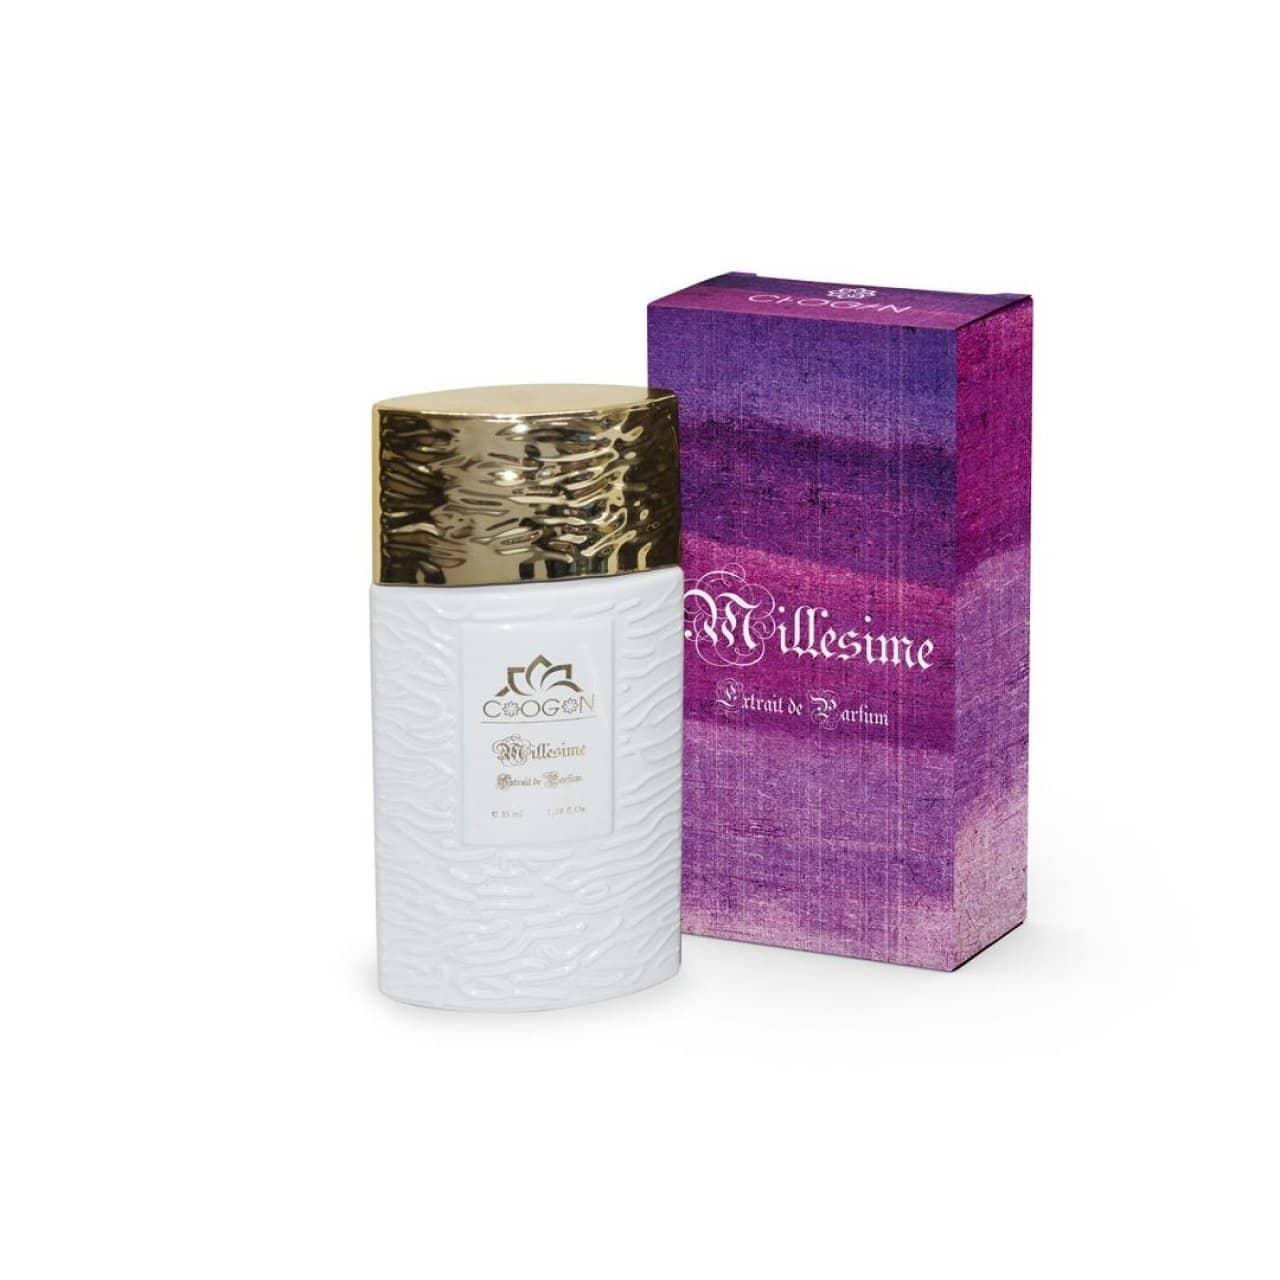 Parfum femme réf -010-35ml